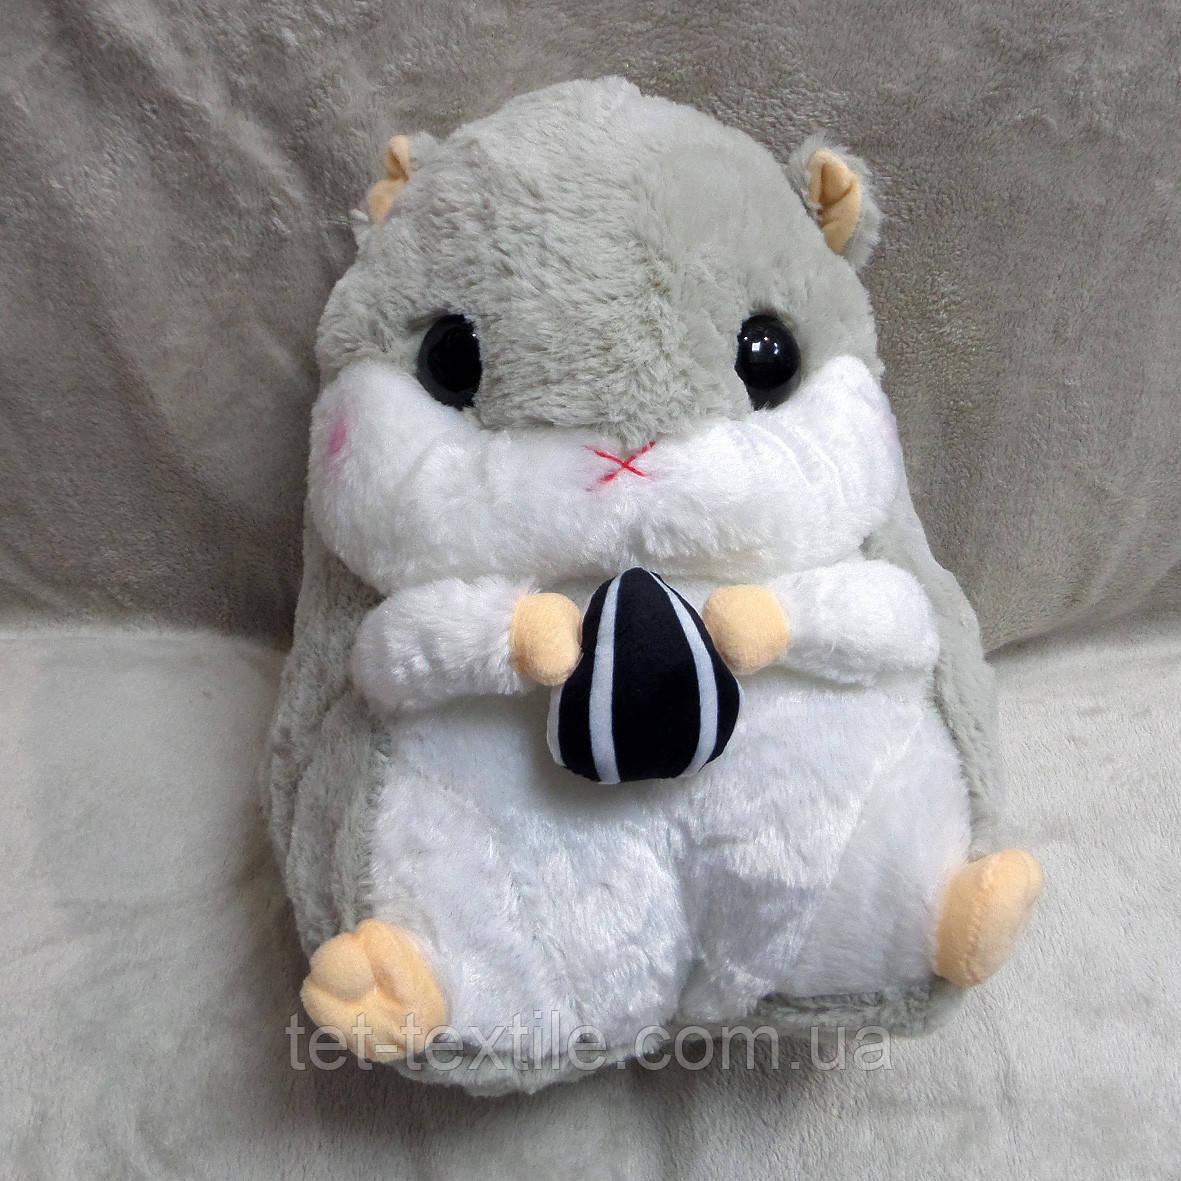 Плед - мягкая игрушка 3 в 1 Бурундучок серый с белым